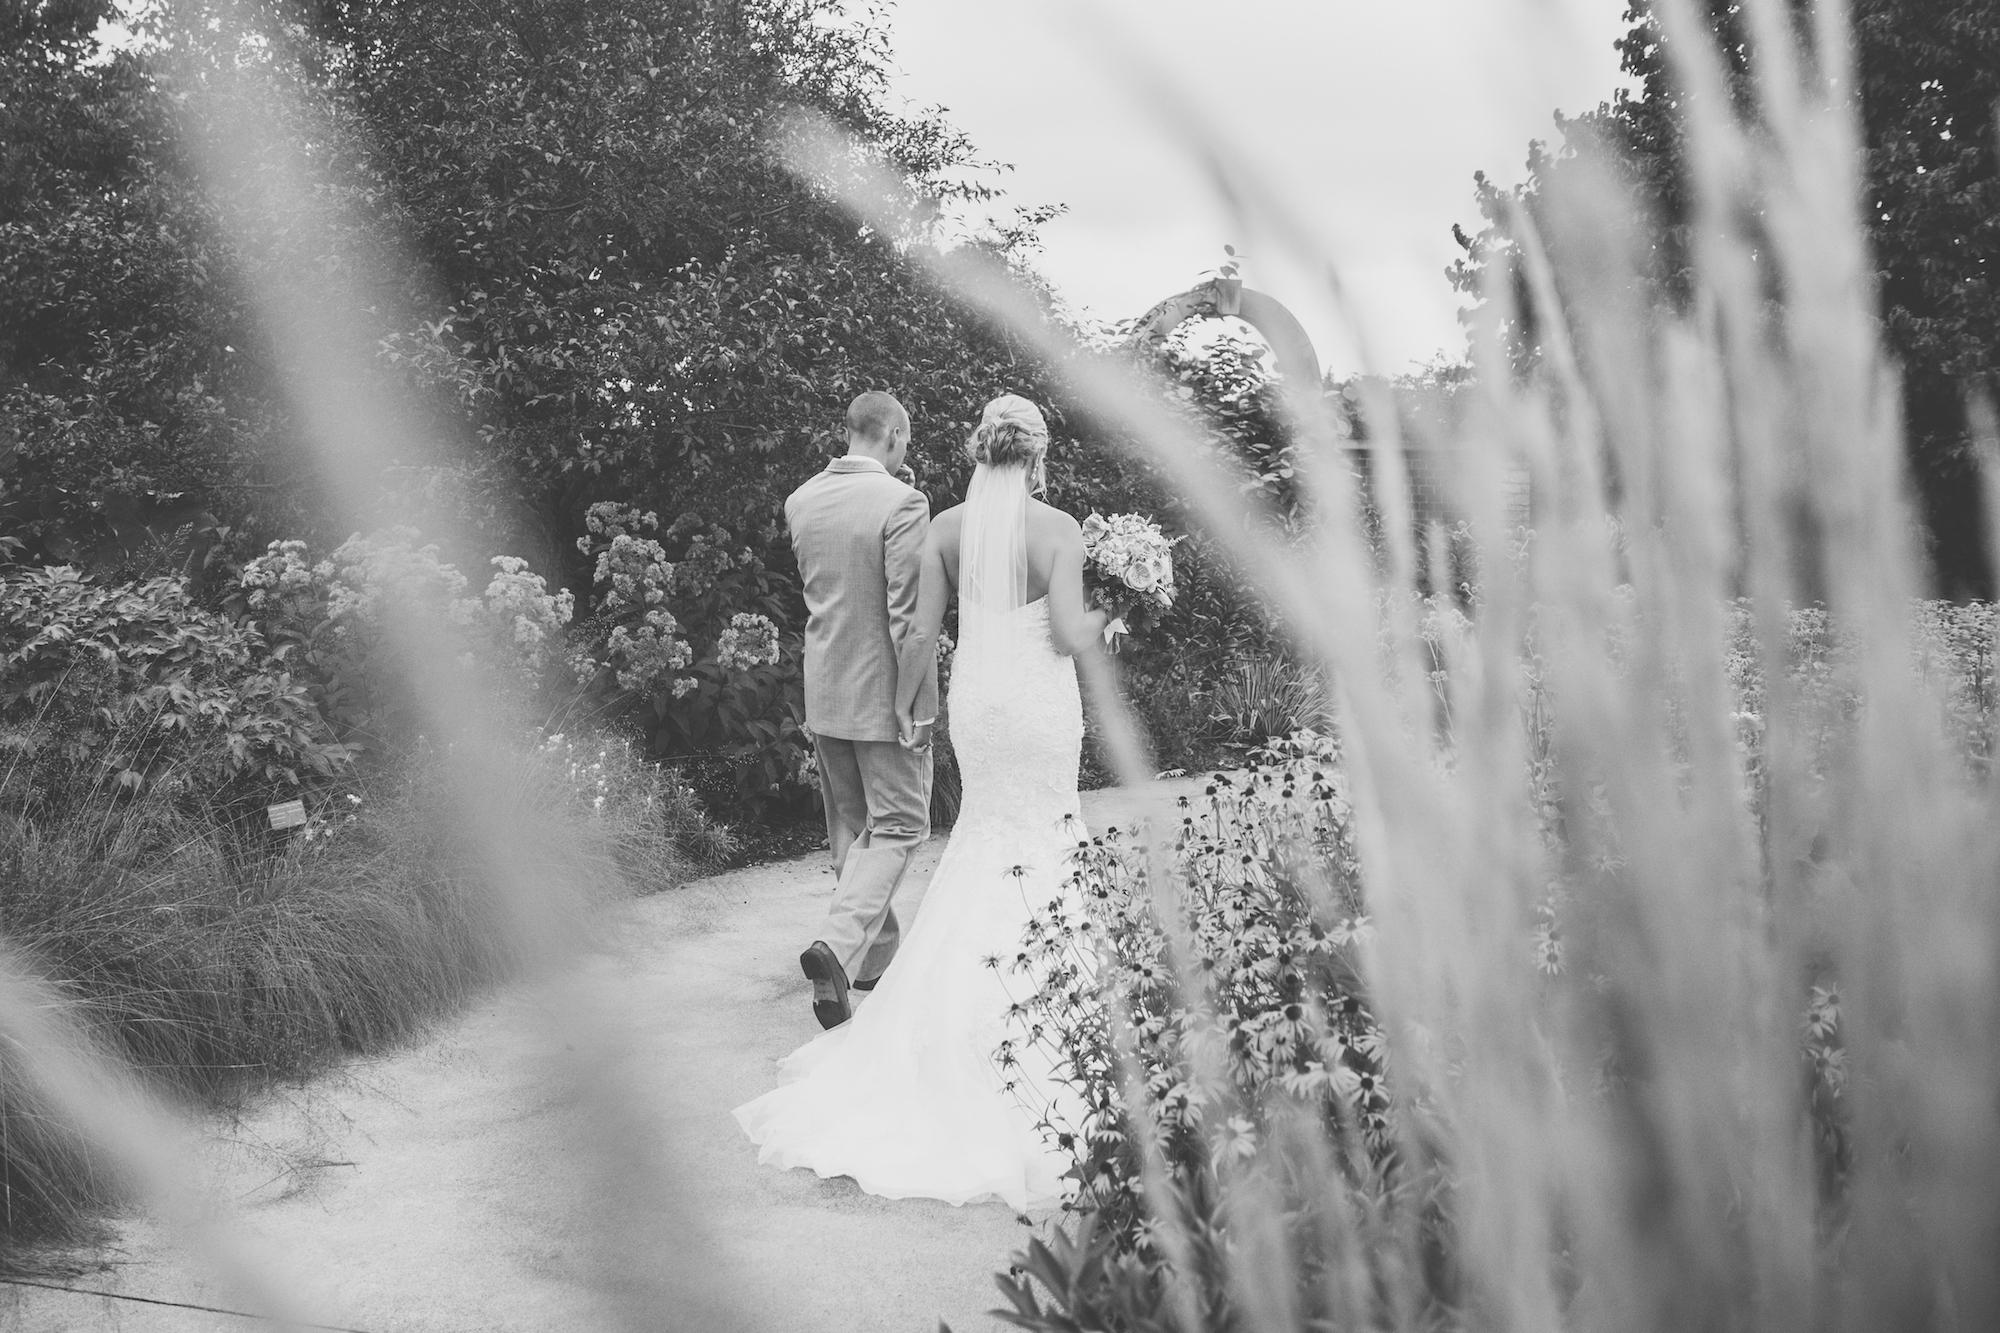 acowsay-cinema-minneapolis-wedding-23.jpg